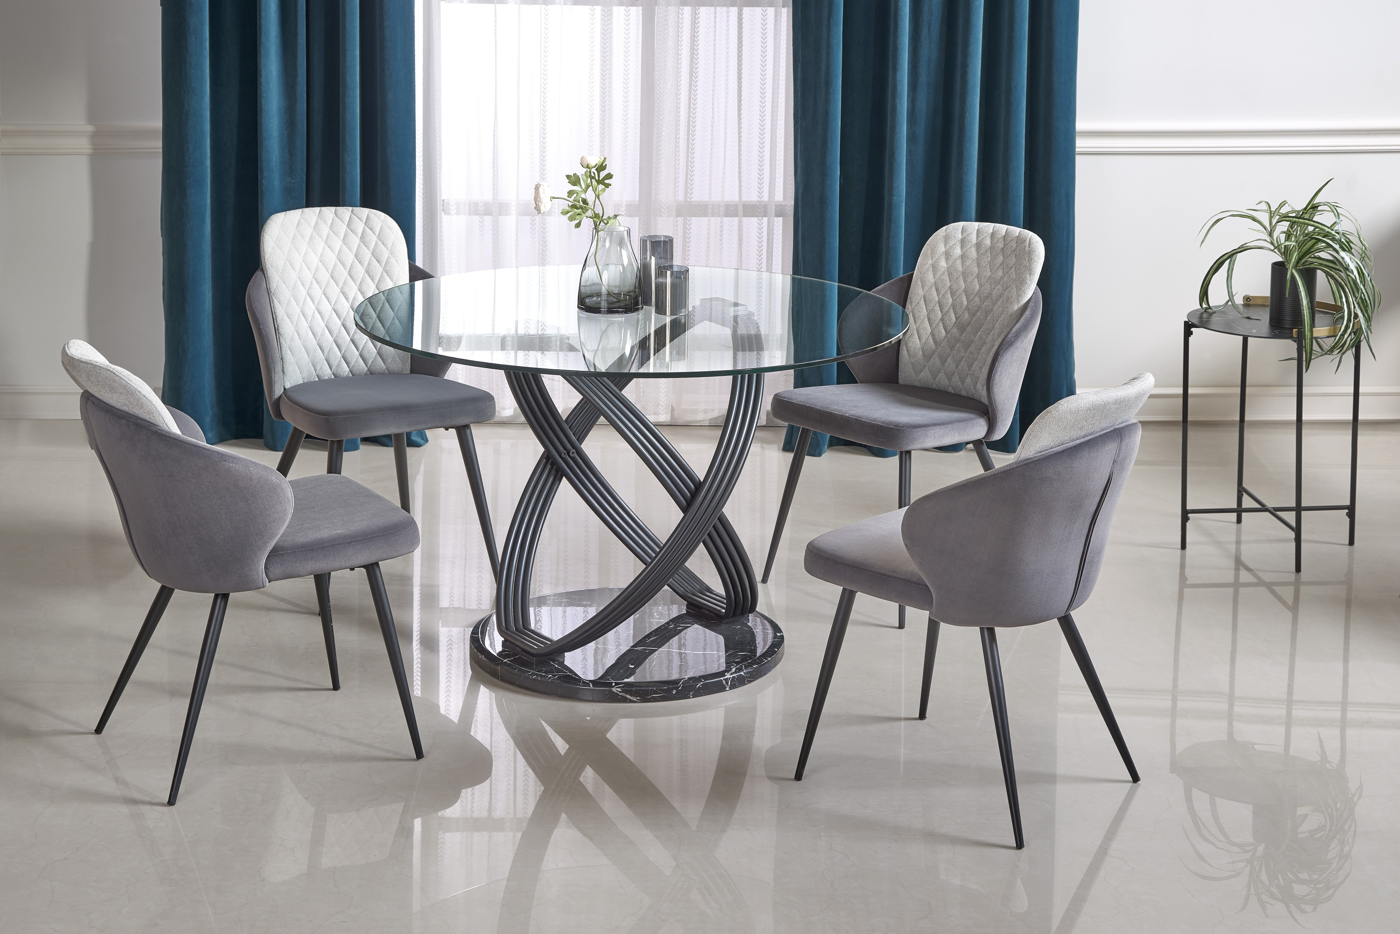 OPTICO stół, blat - transparentny, nogi - czarny